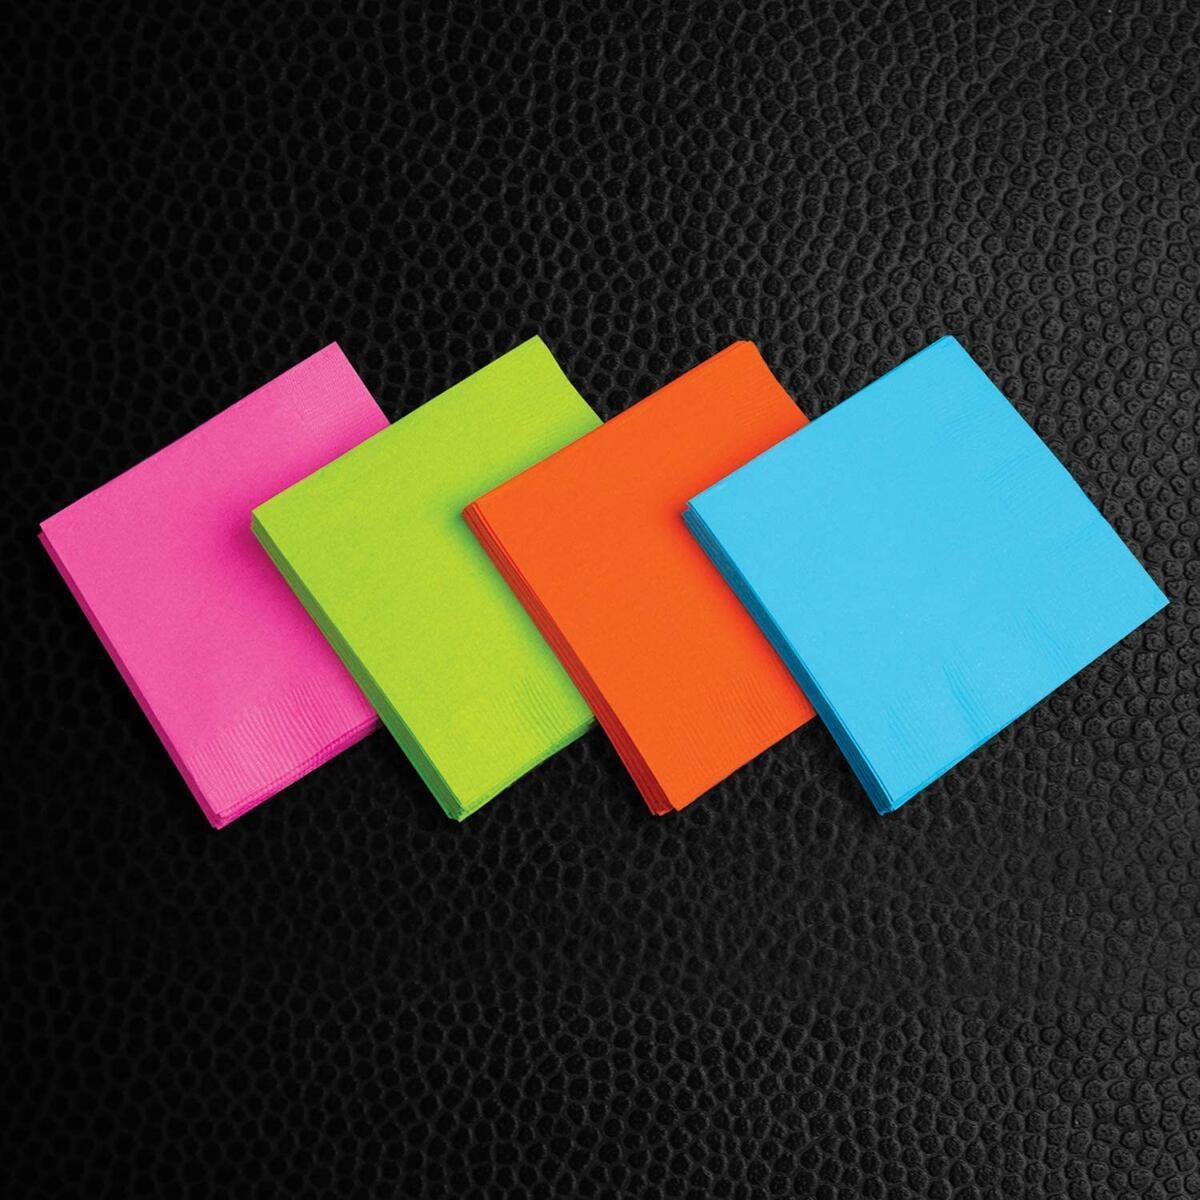 128 Piece Party Supplies Set/ Blacklight UV Glow in The Dark Kit, Assorted Neon